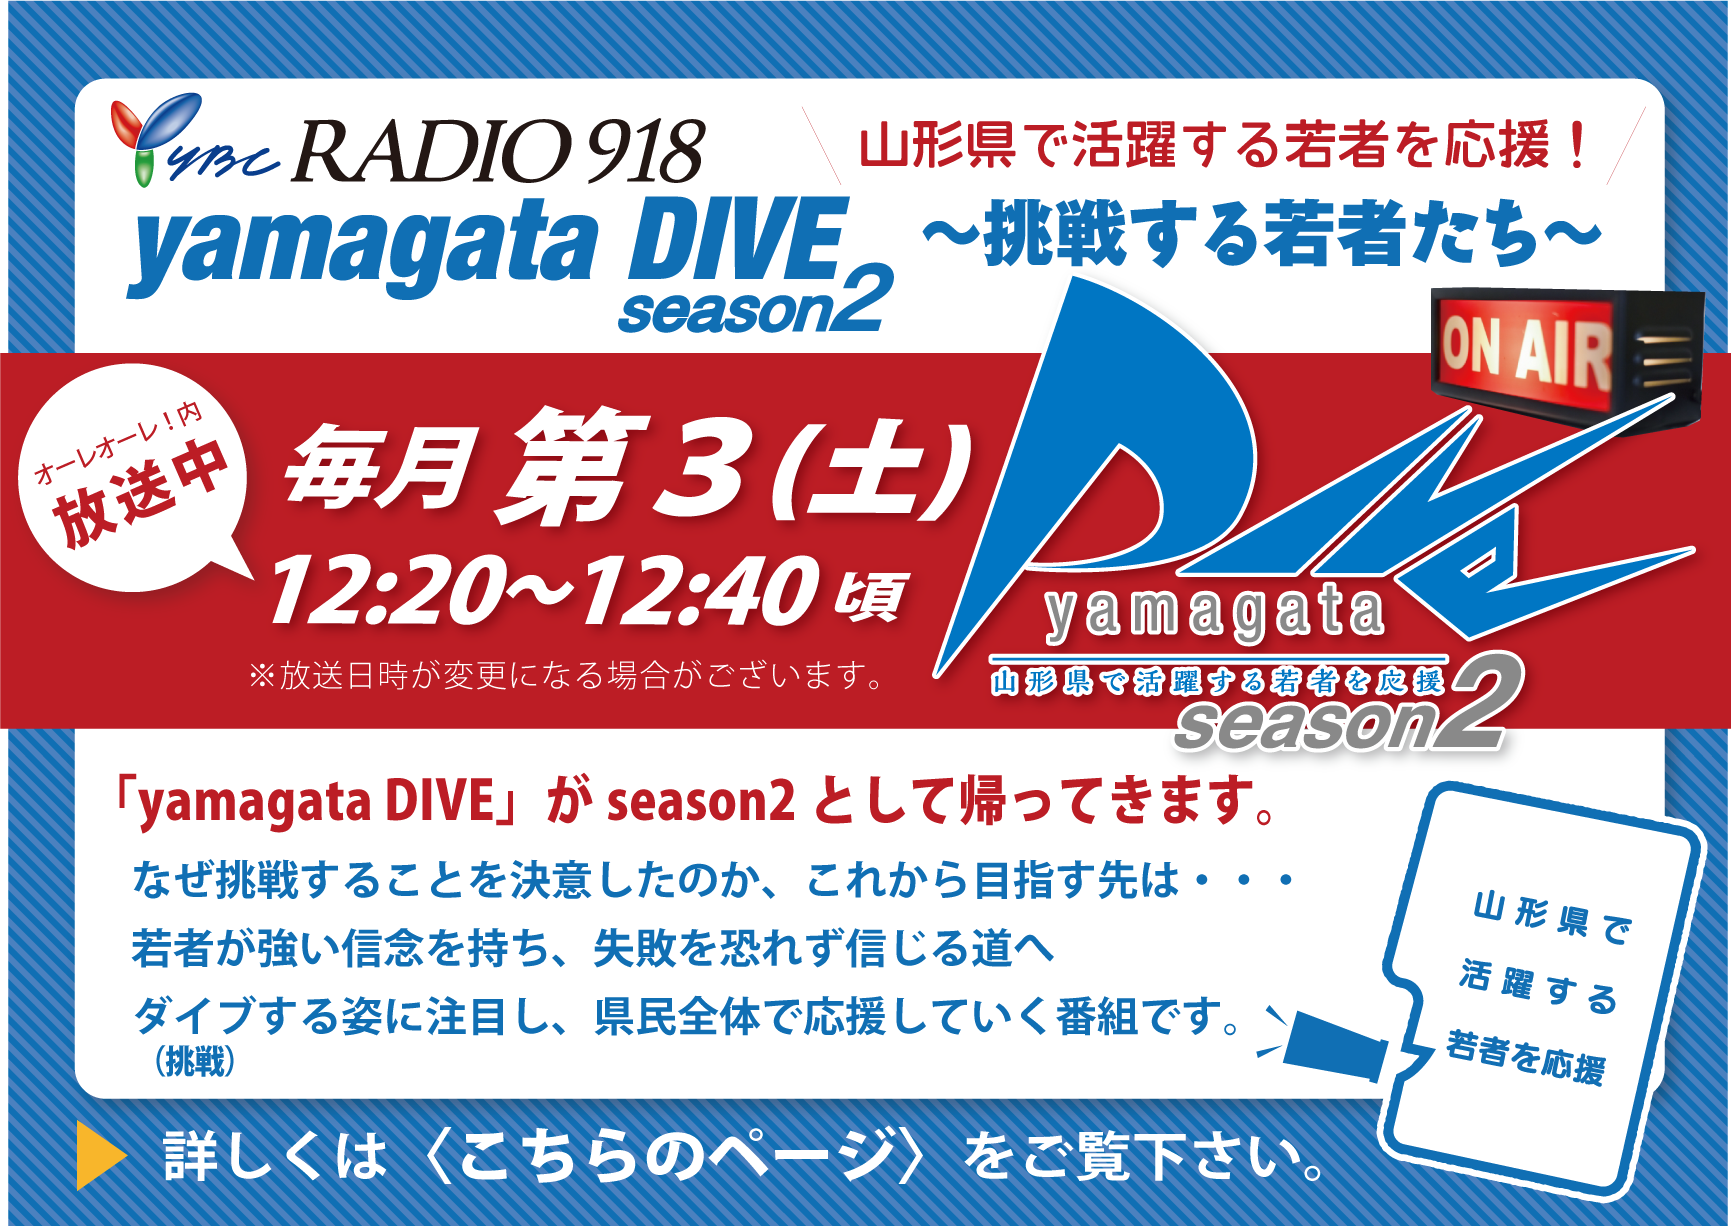 YBCラジオ(918kHz)番組「yamagata DIVE season2」出演者ご紹介